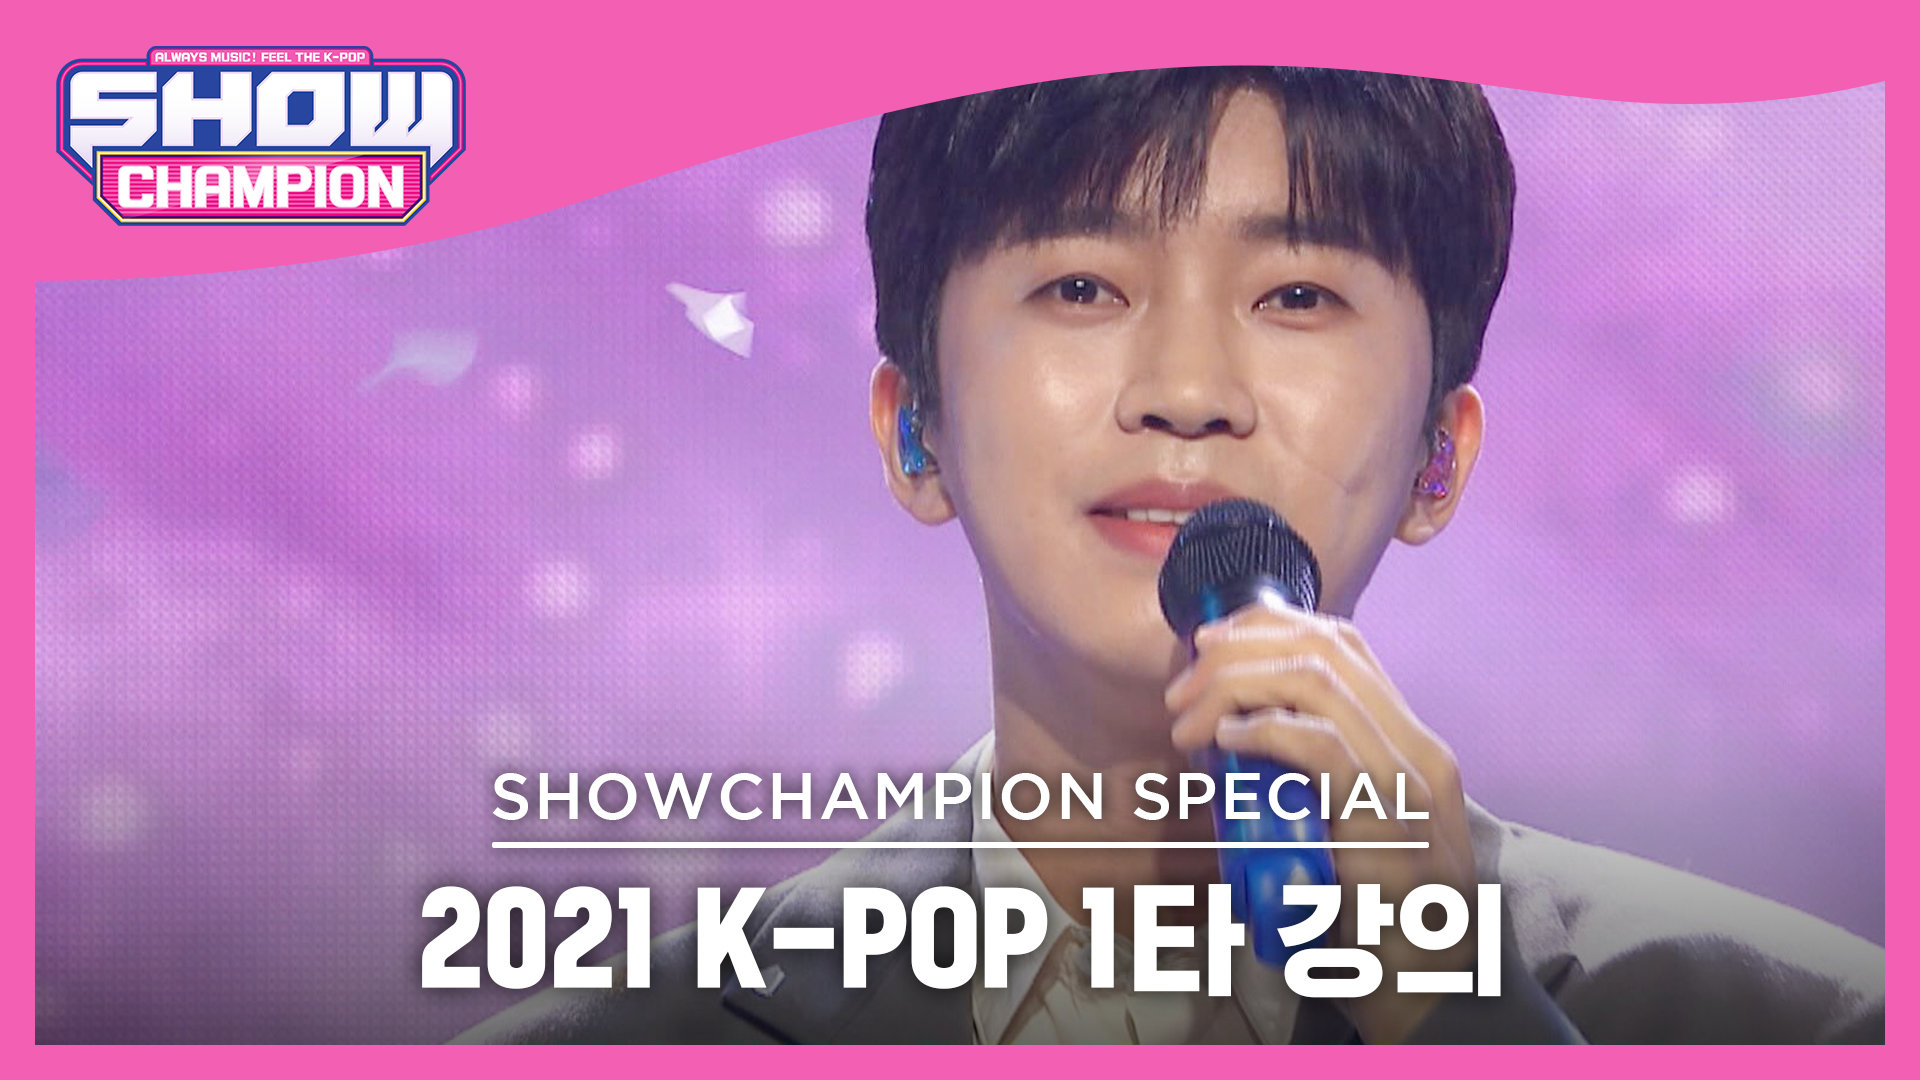 [2021 K-POP 1타 강의] Lim Young Woong - My Starry Love (임영웅 - 별빛 같은 나의 사랑아)